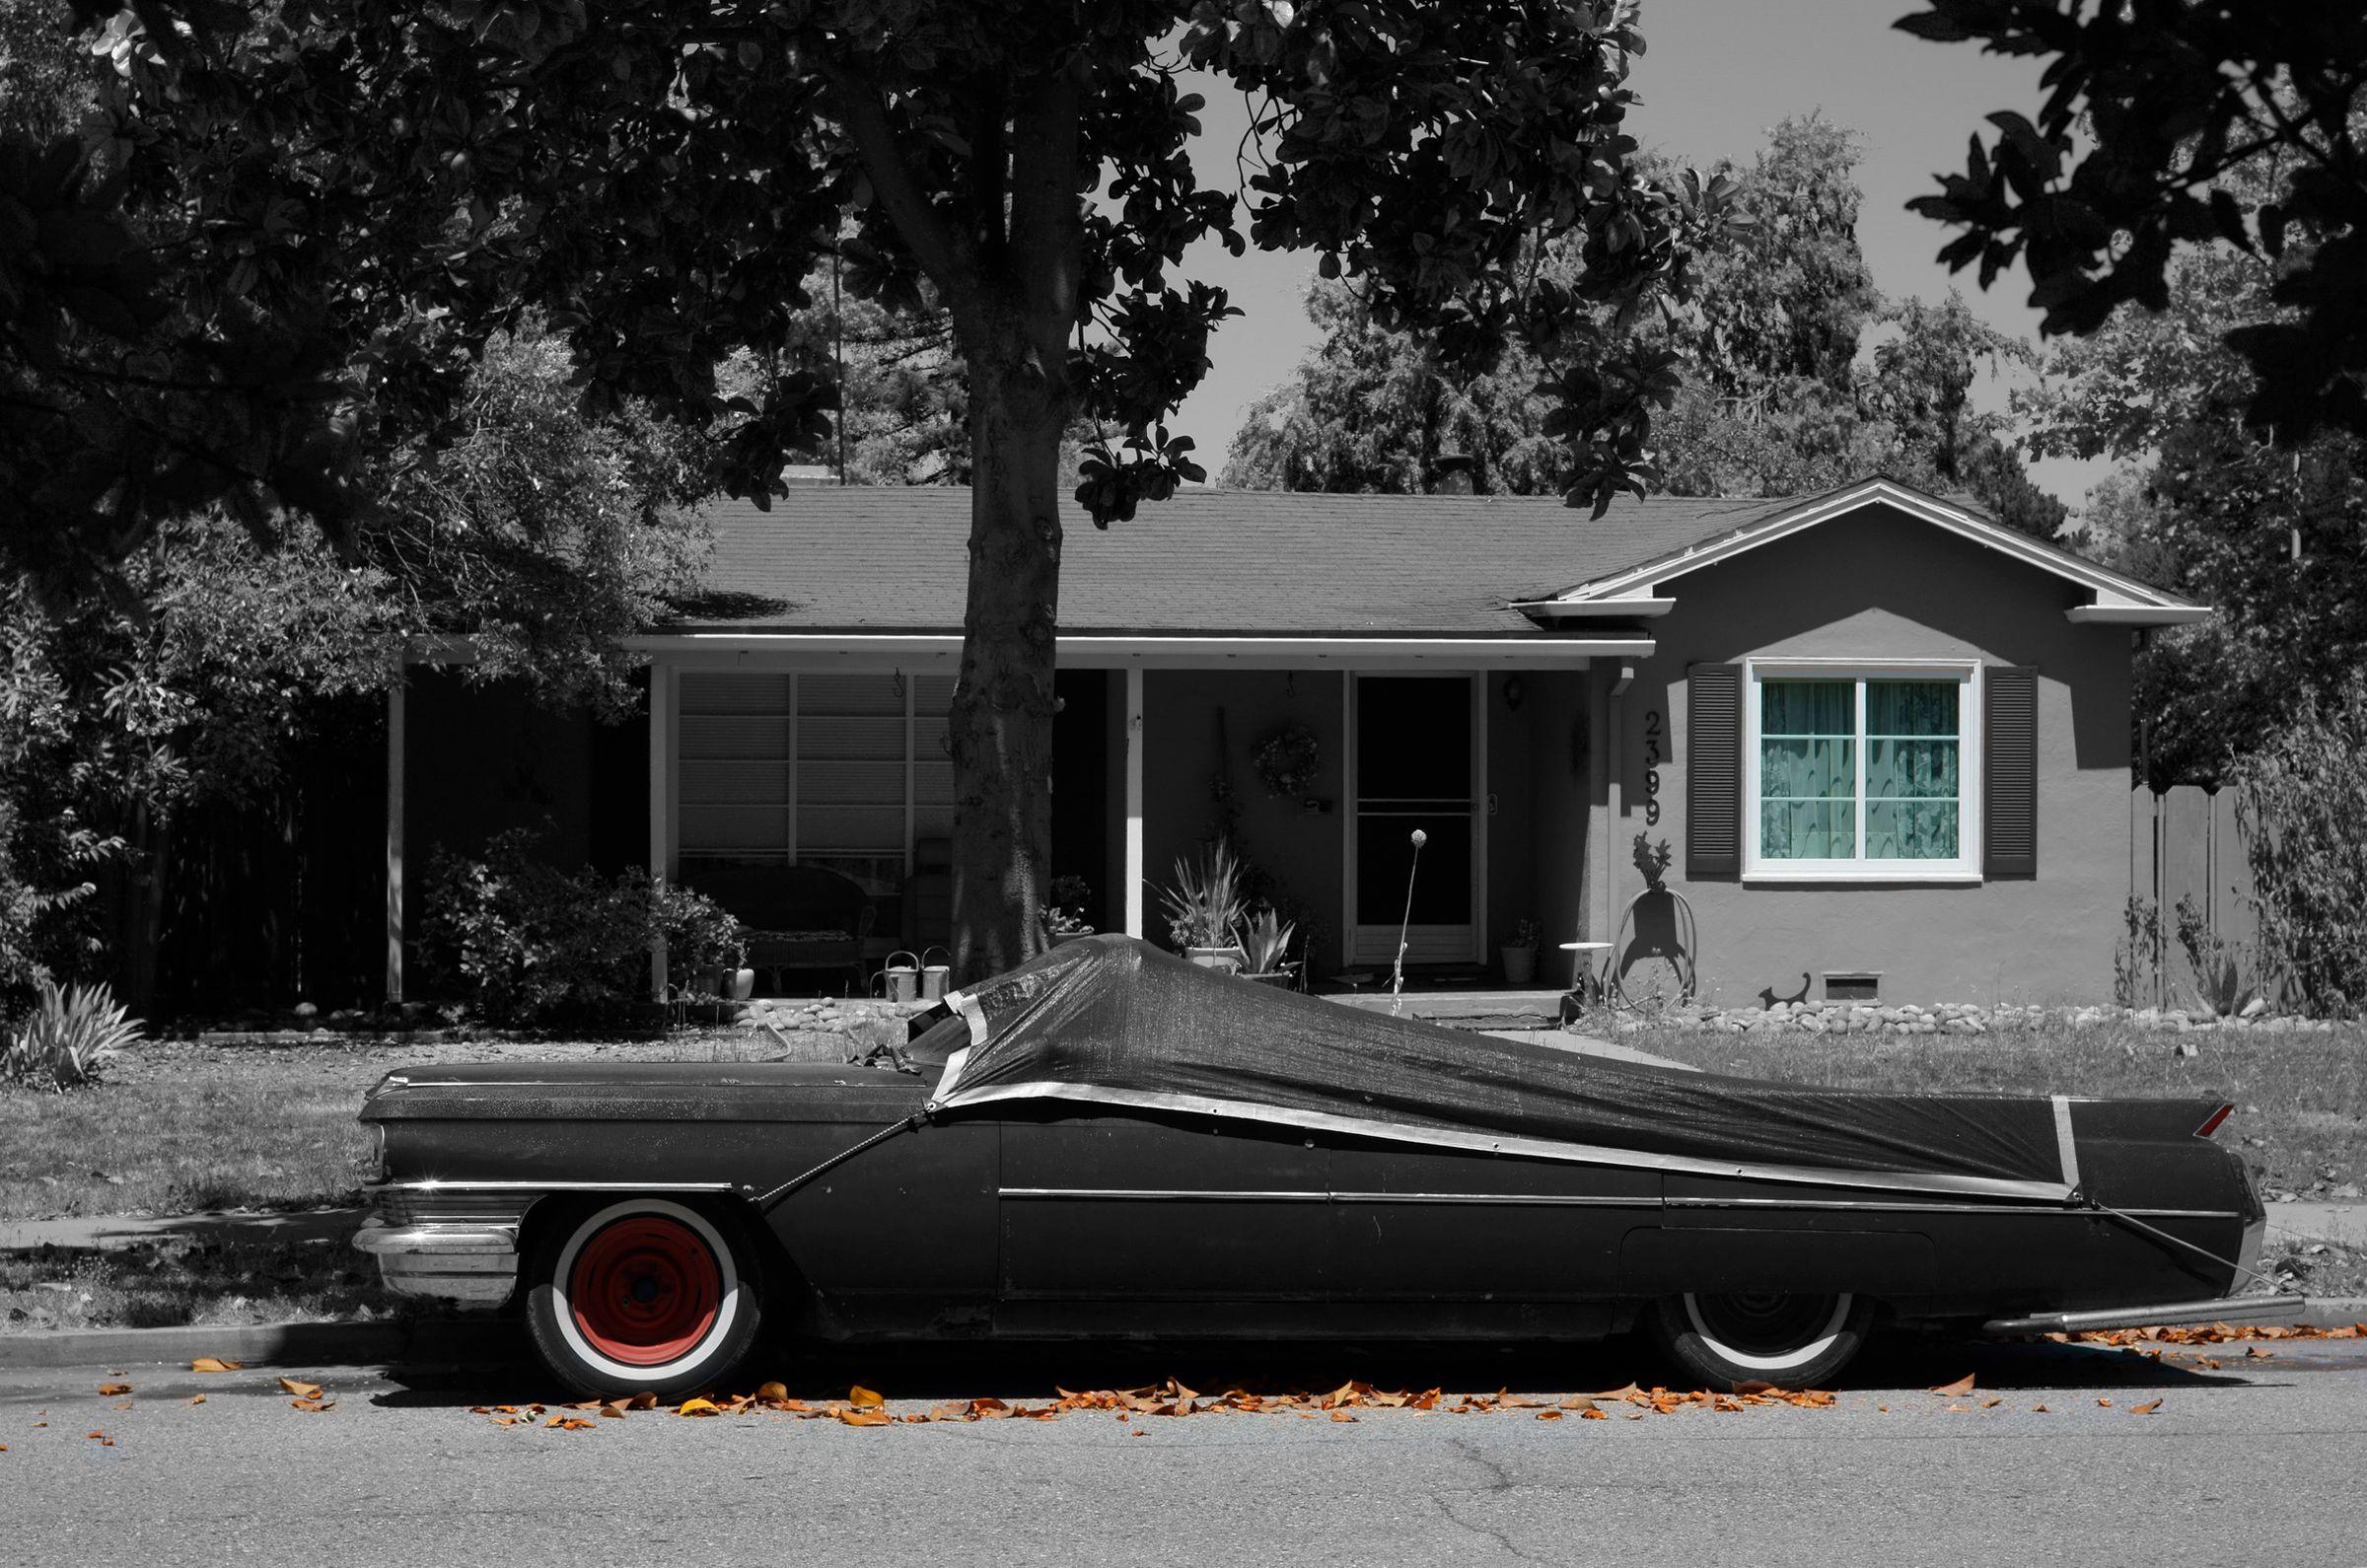 Cadillac at Rest, Palo ALto